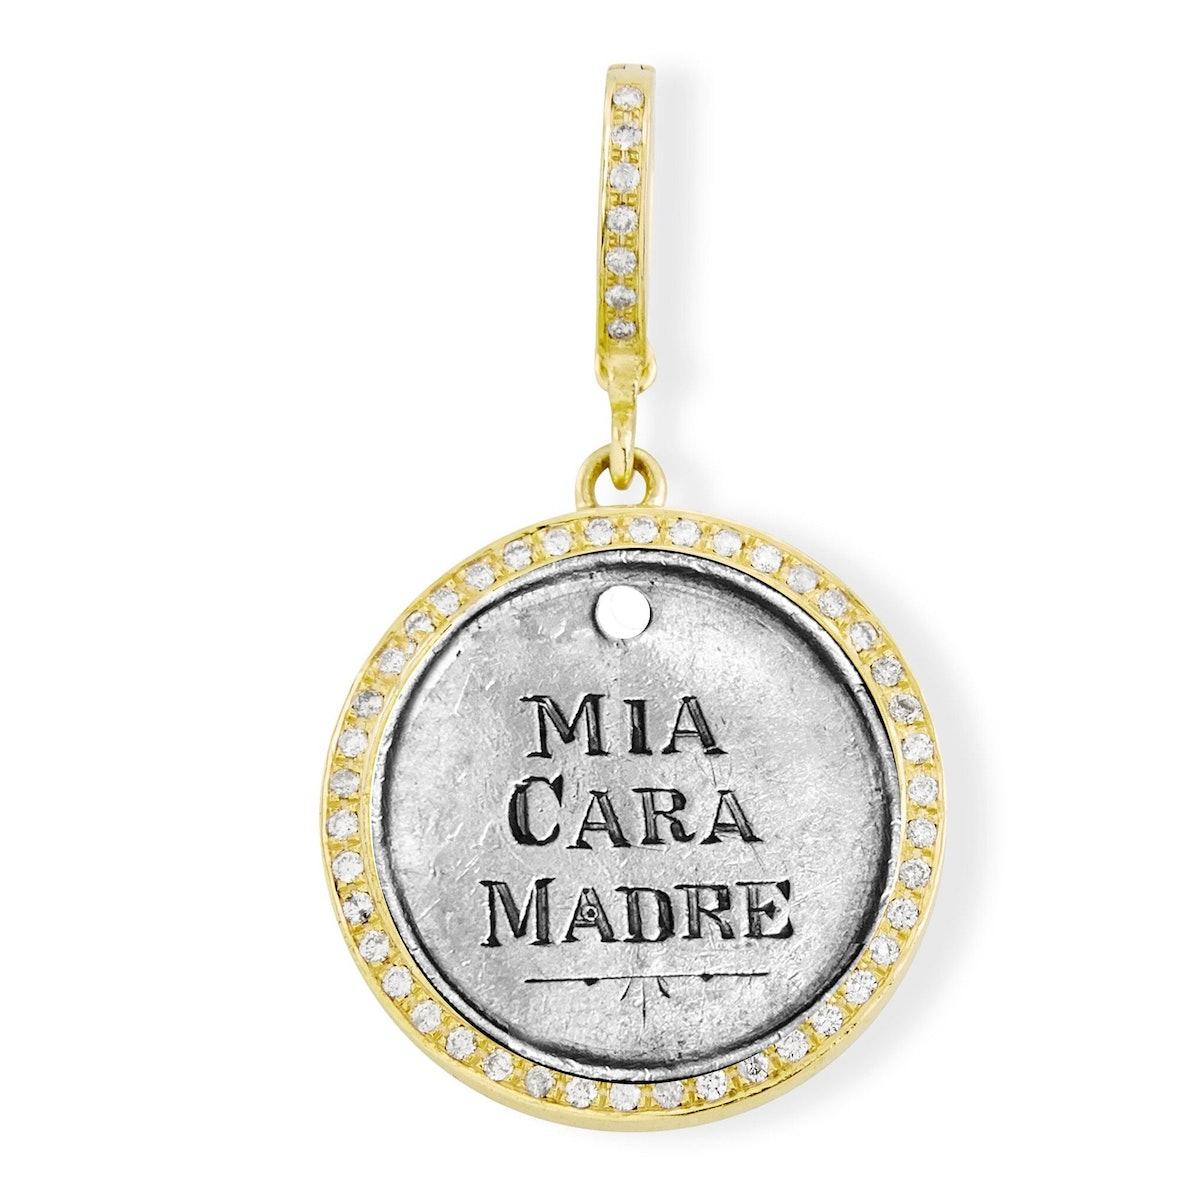 Mi Cara Madre (My Dear Mother) British Love Token